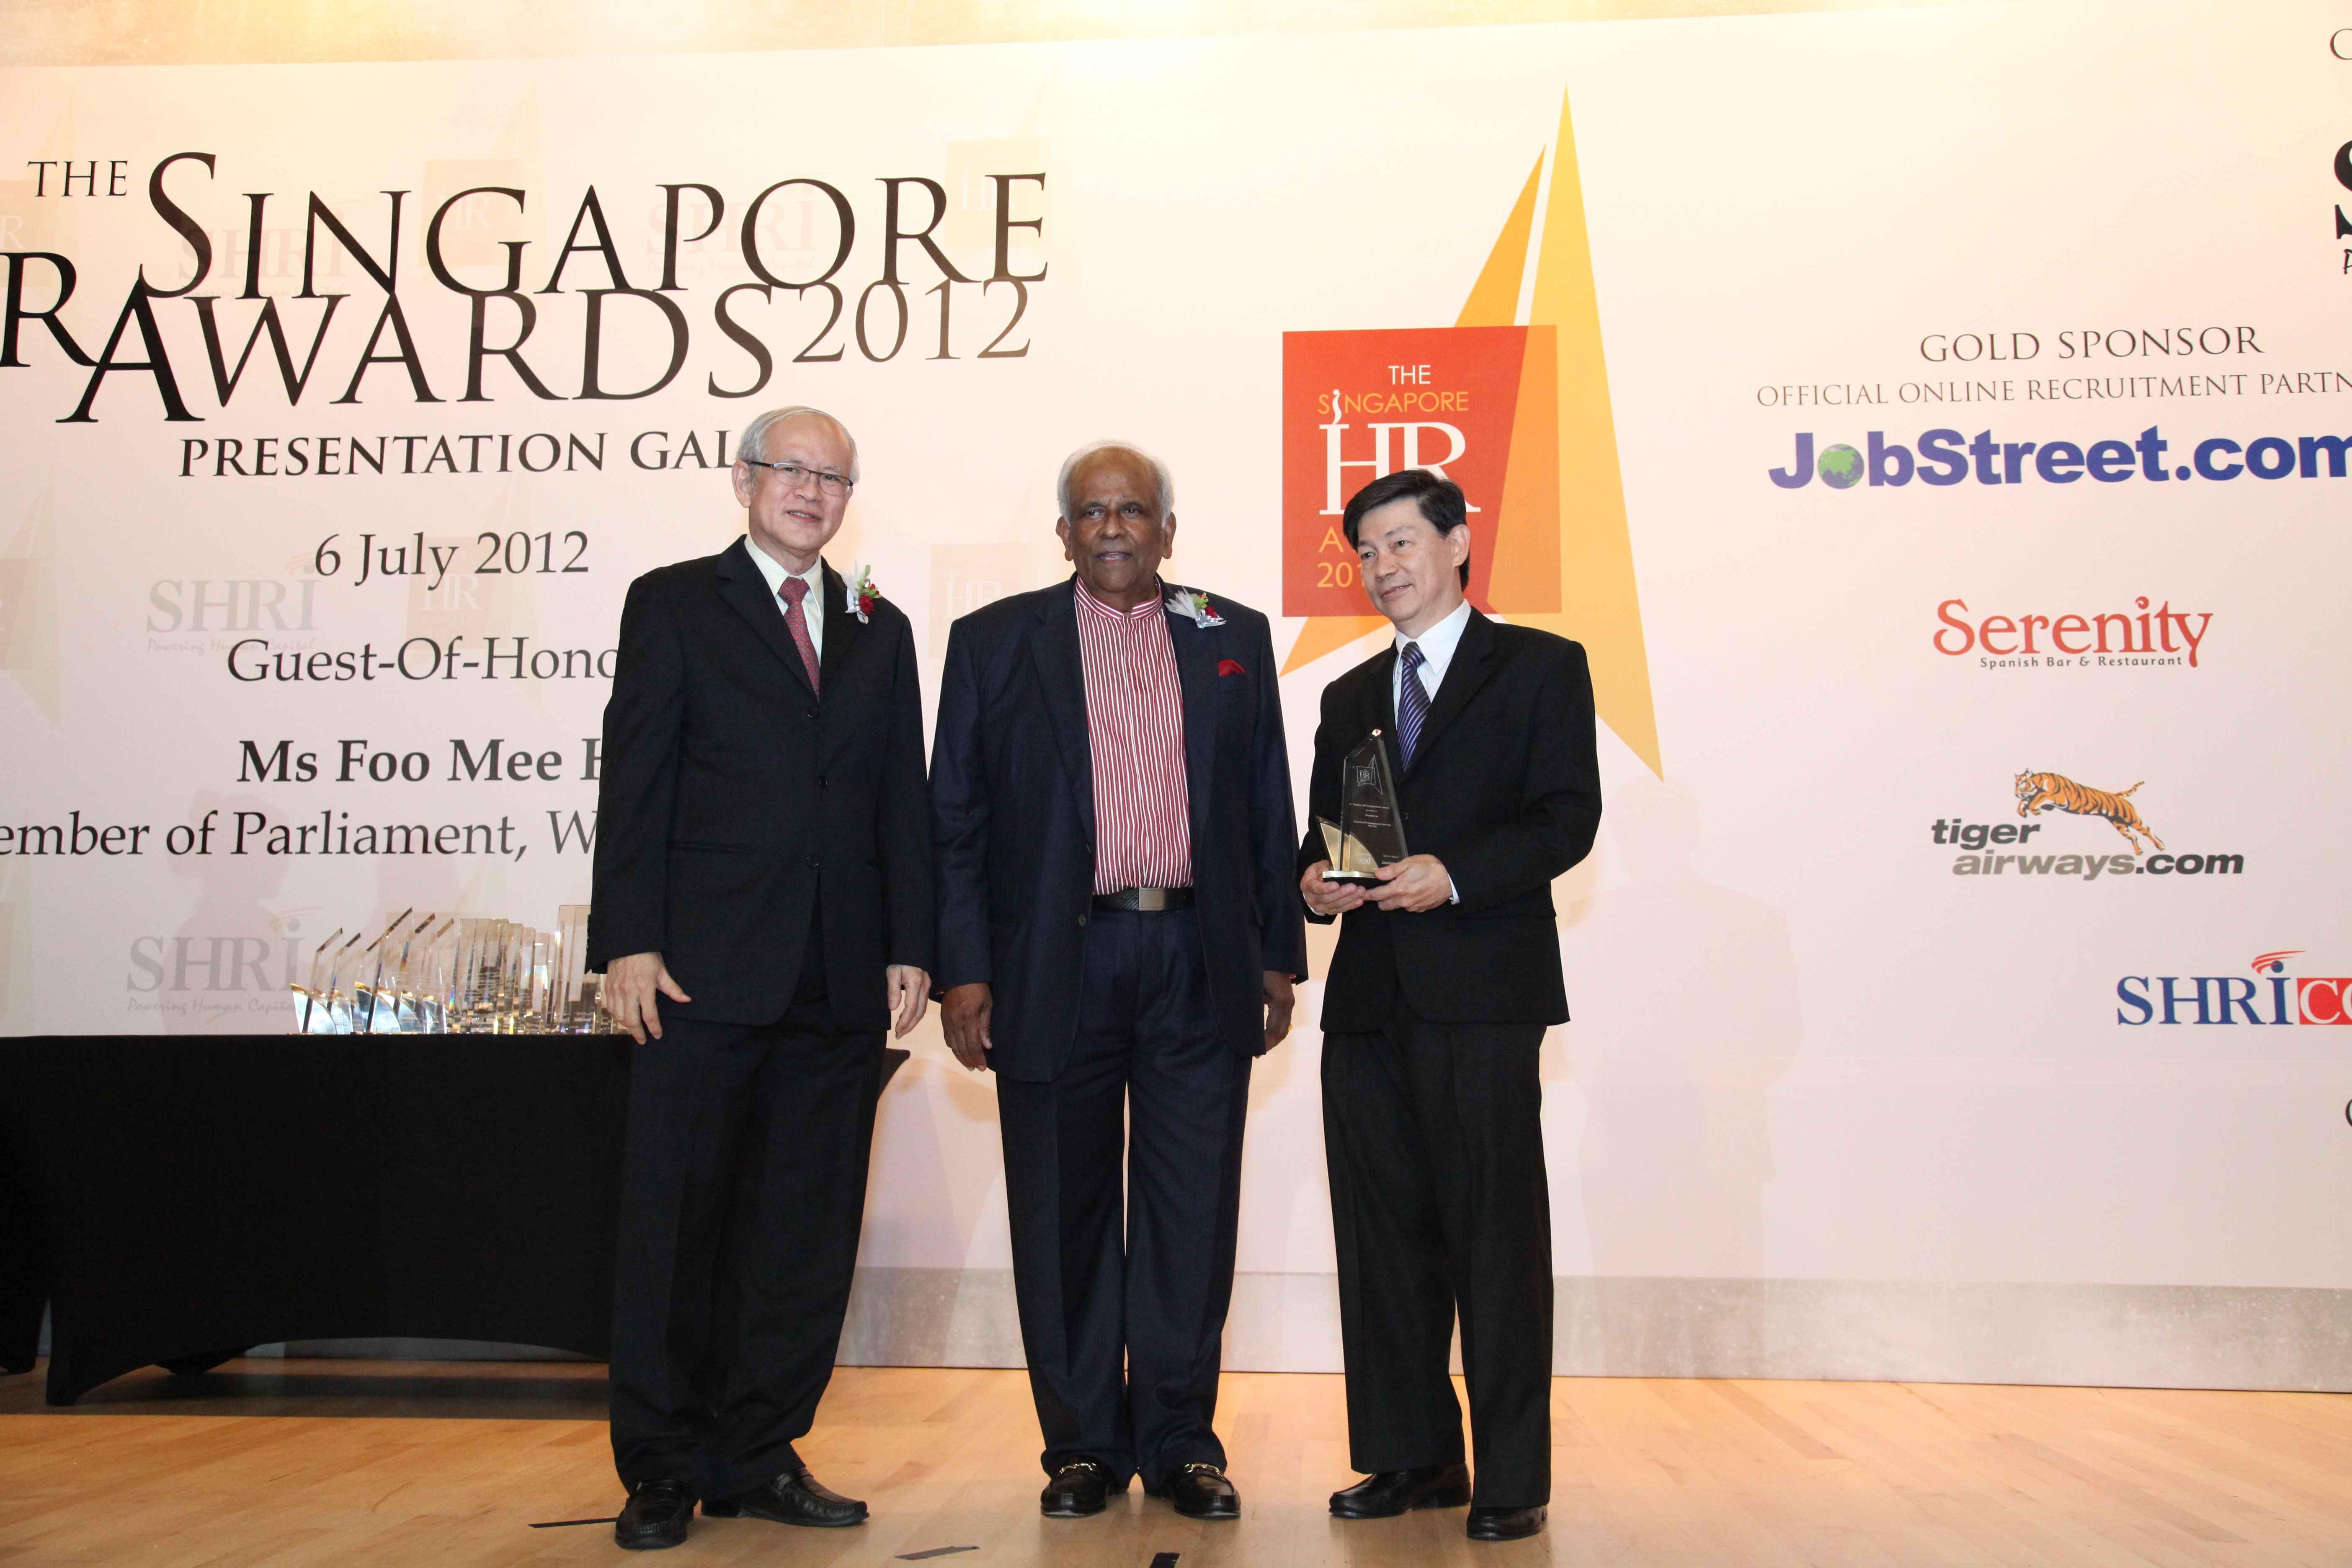 The Singapore Hr Awards 2012